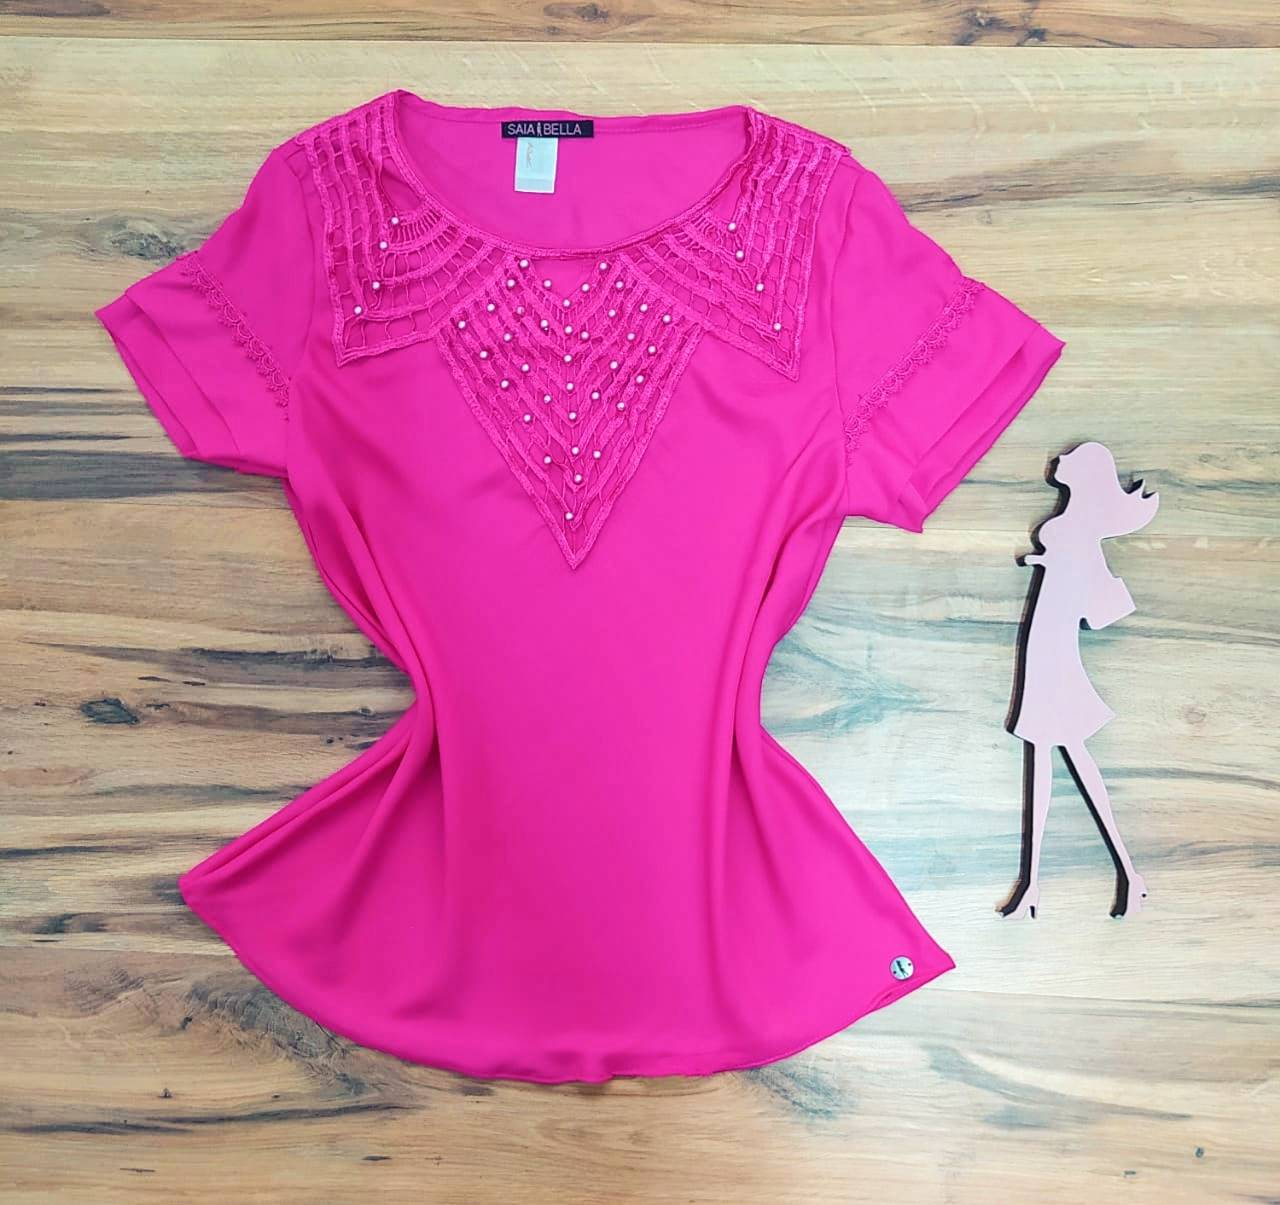 Blusa Nataly de Renda Saia Bella - SB774017 - Pink